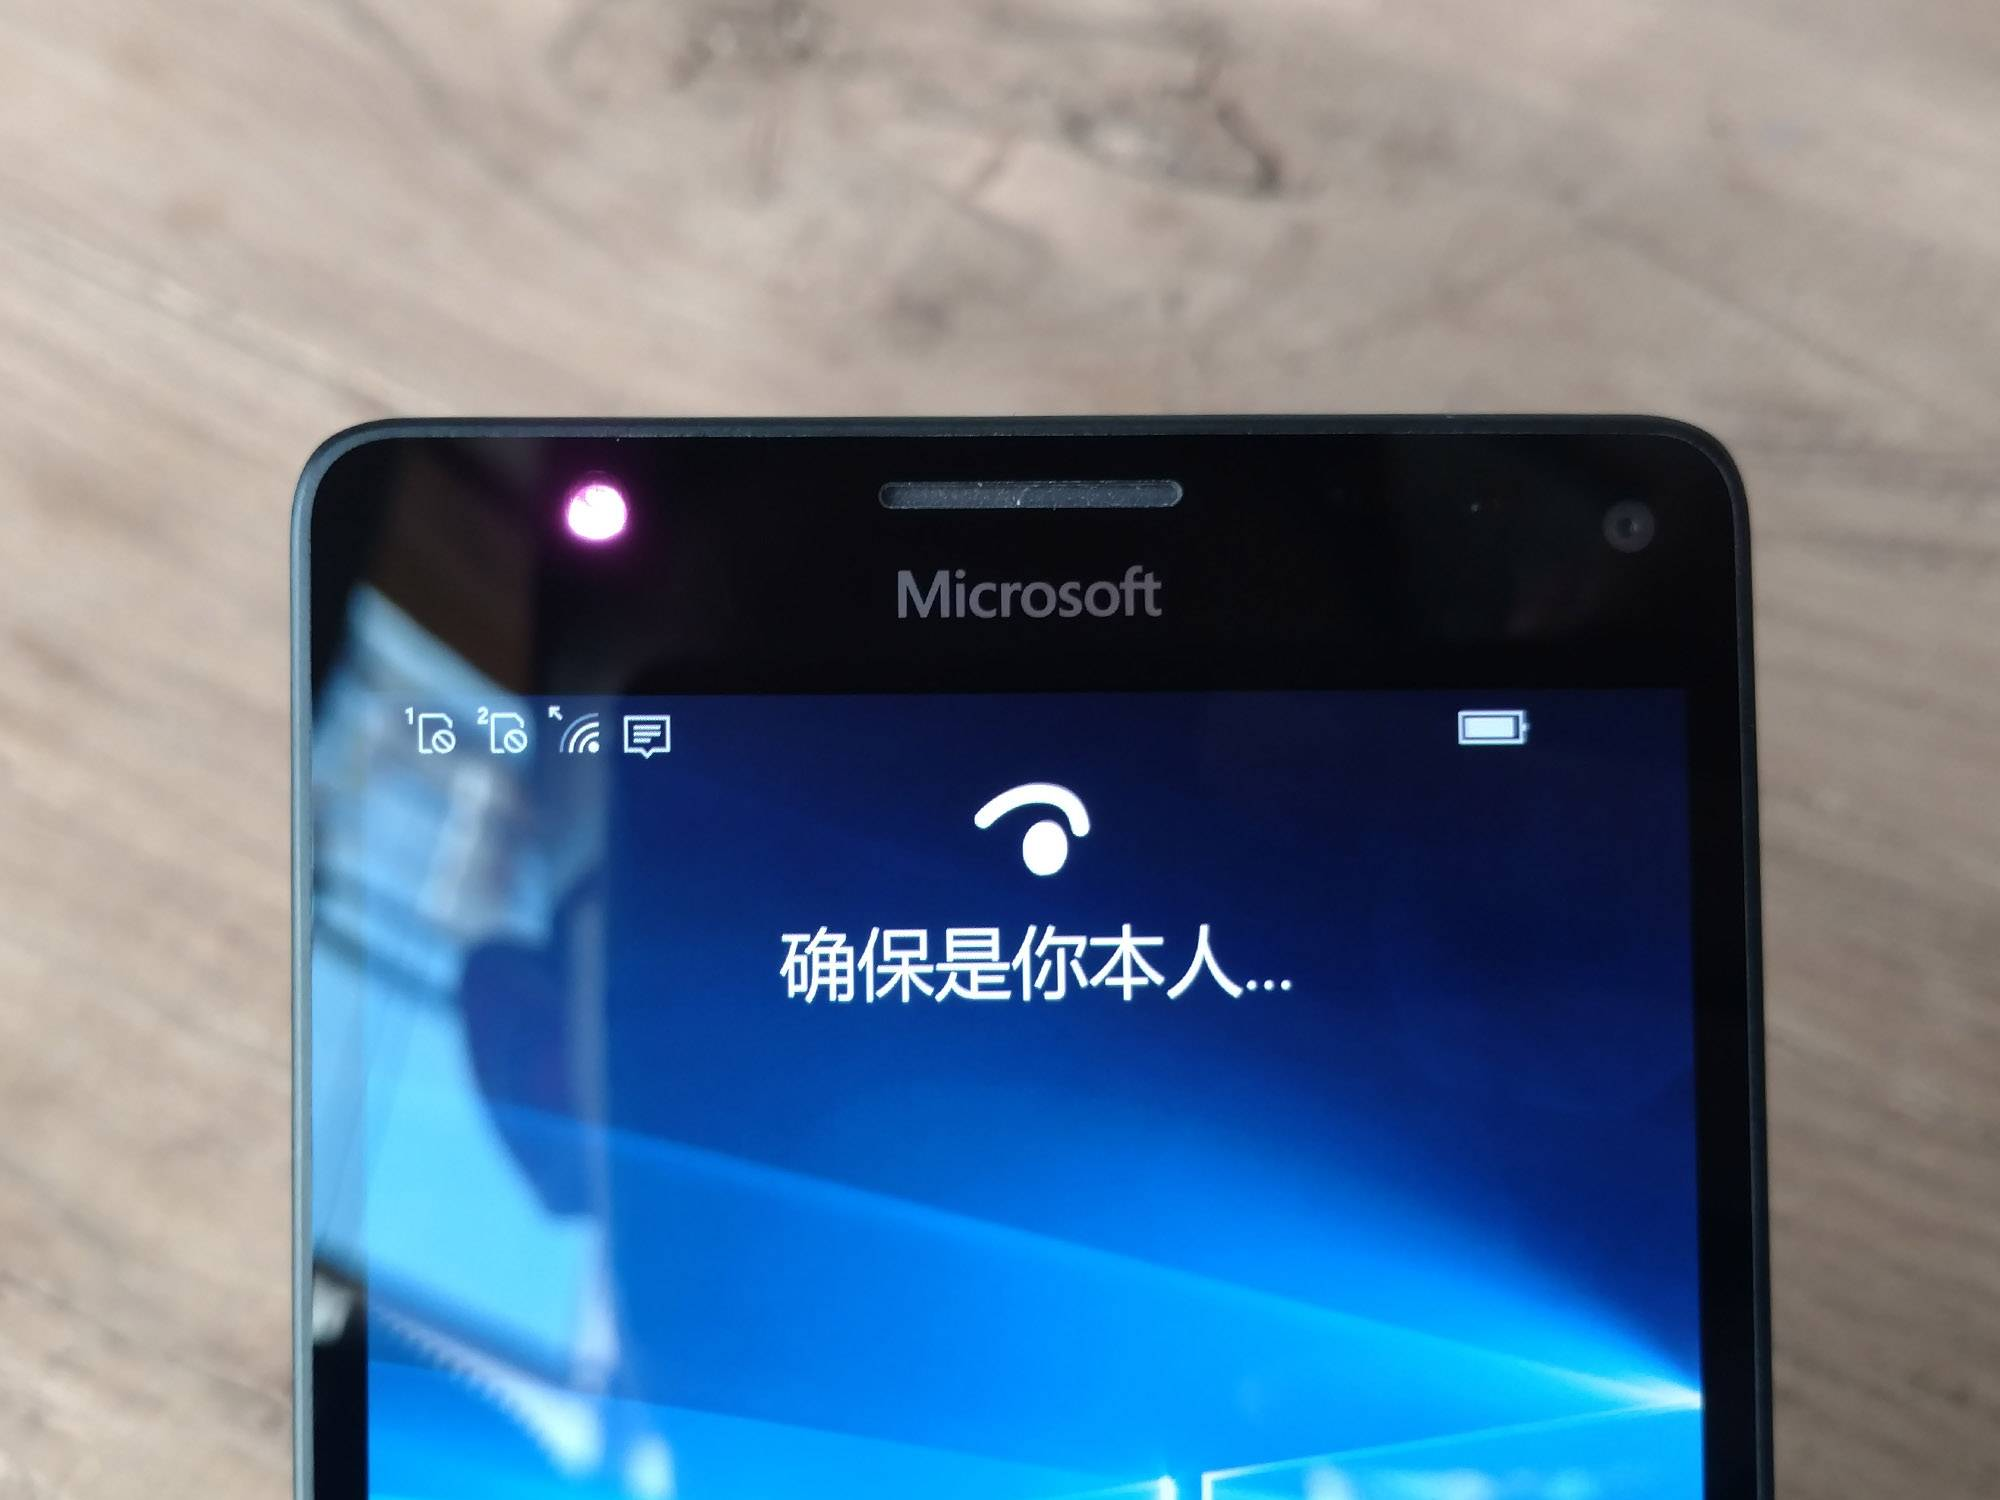 Microsoft Windows 10 Lumia 950XL 950 Continuum 7